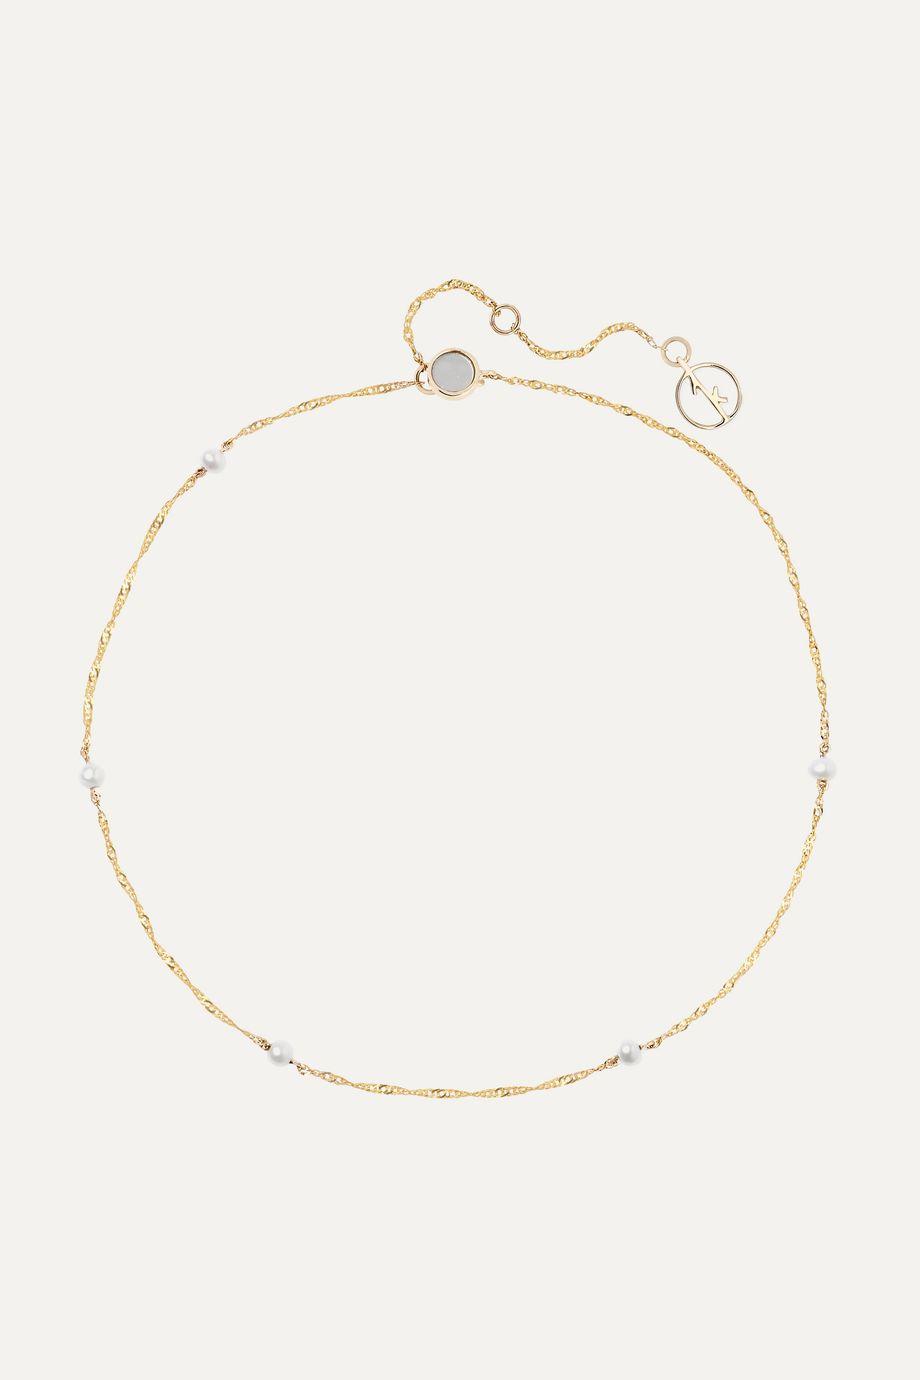 Anissa Kermiche 14-karat gold pearl anklet